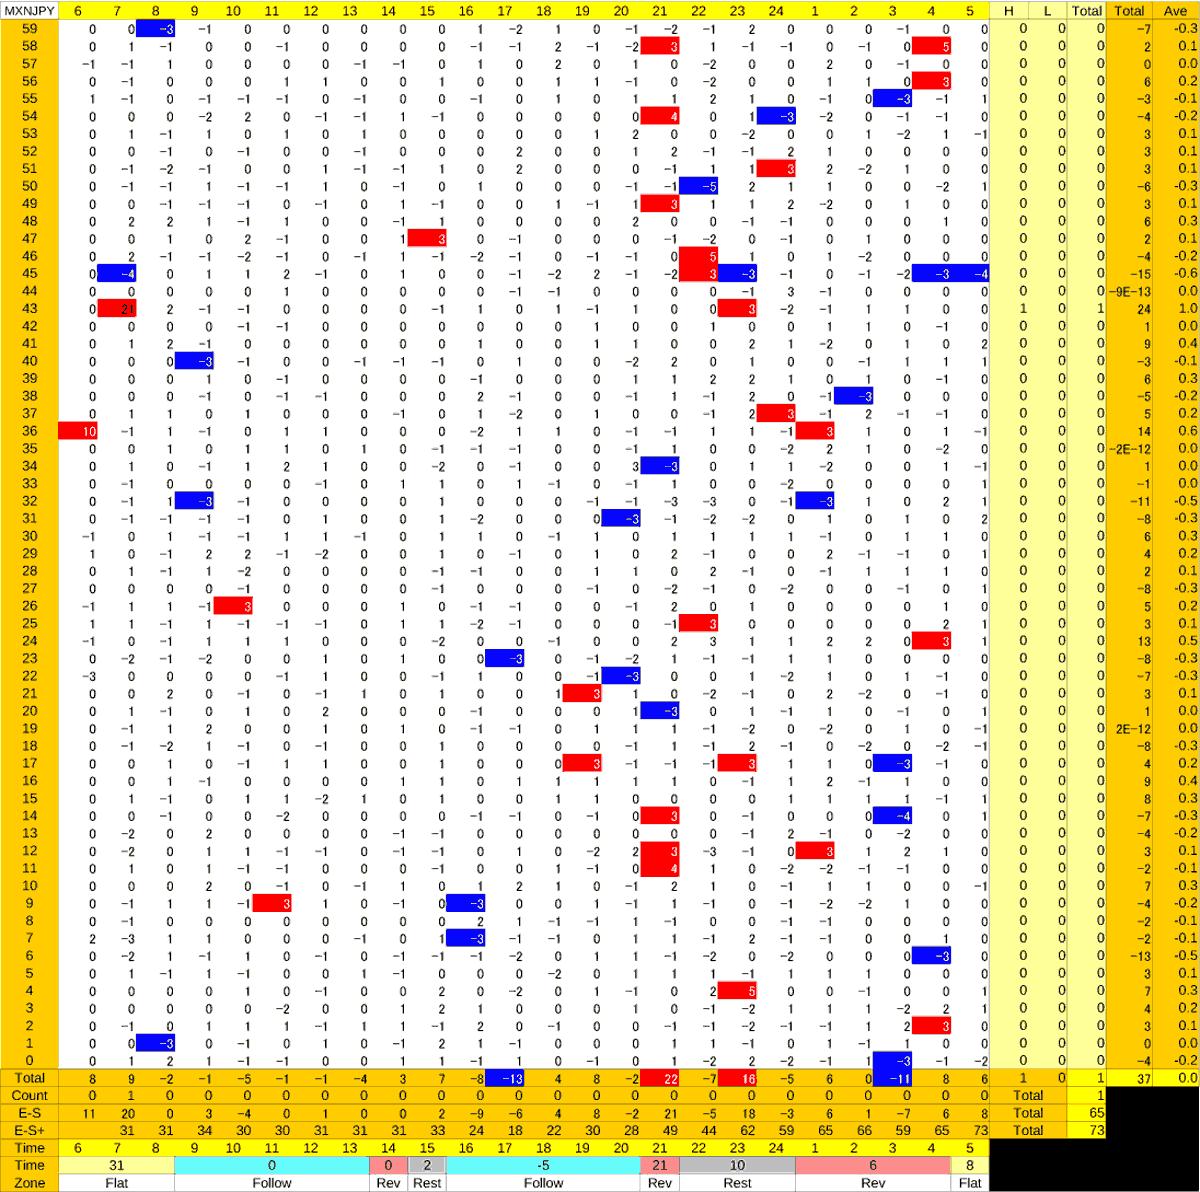 20200727_HS(3)MXNJPY